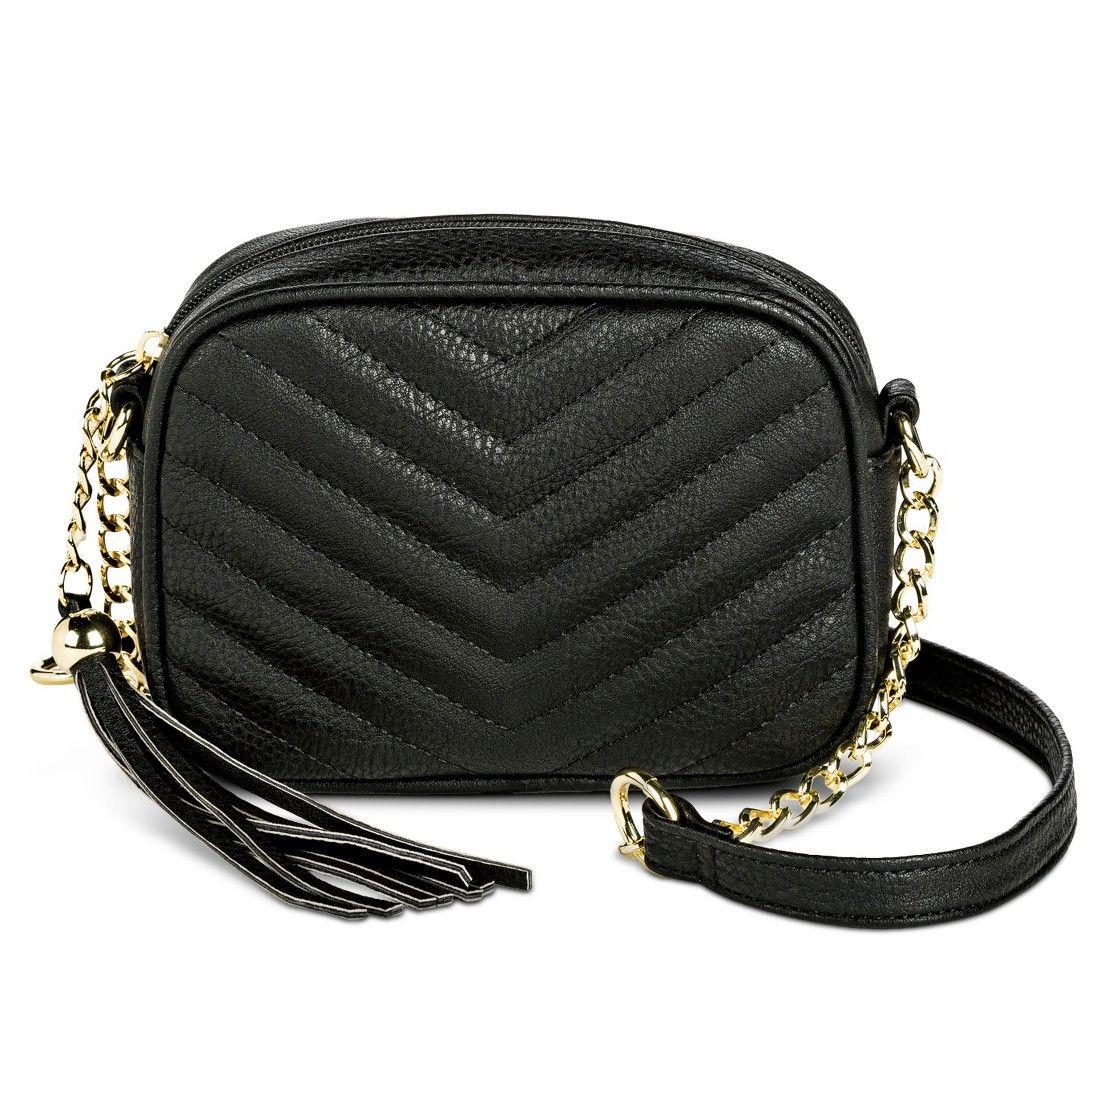 Women's Quilted Crossbody Handbag with Tassel